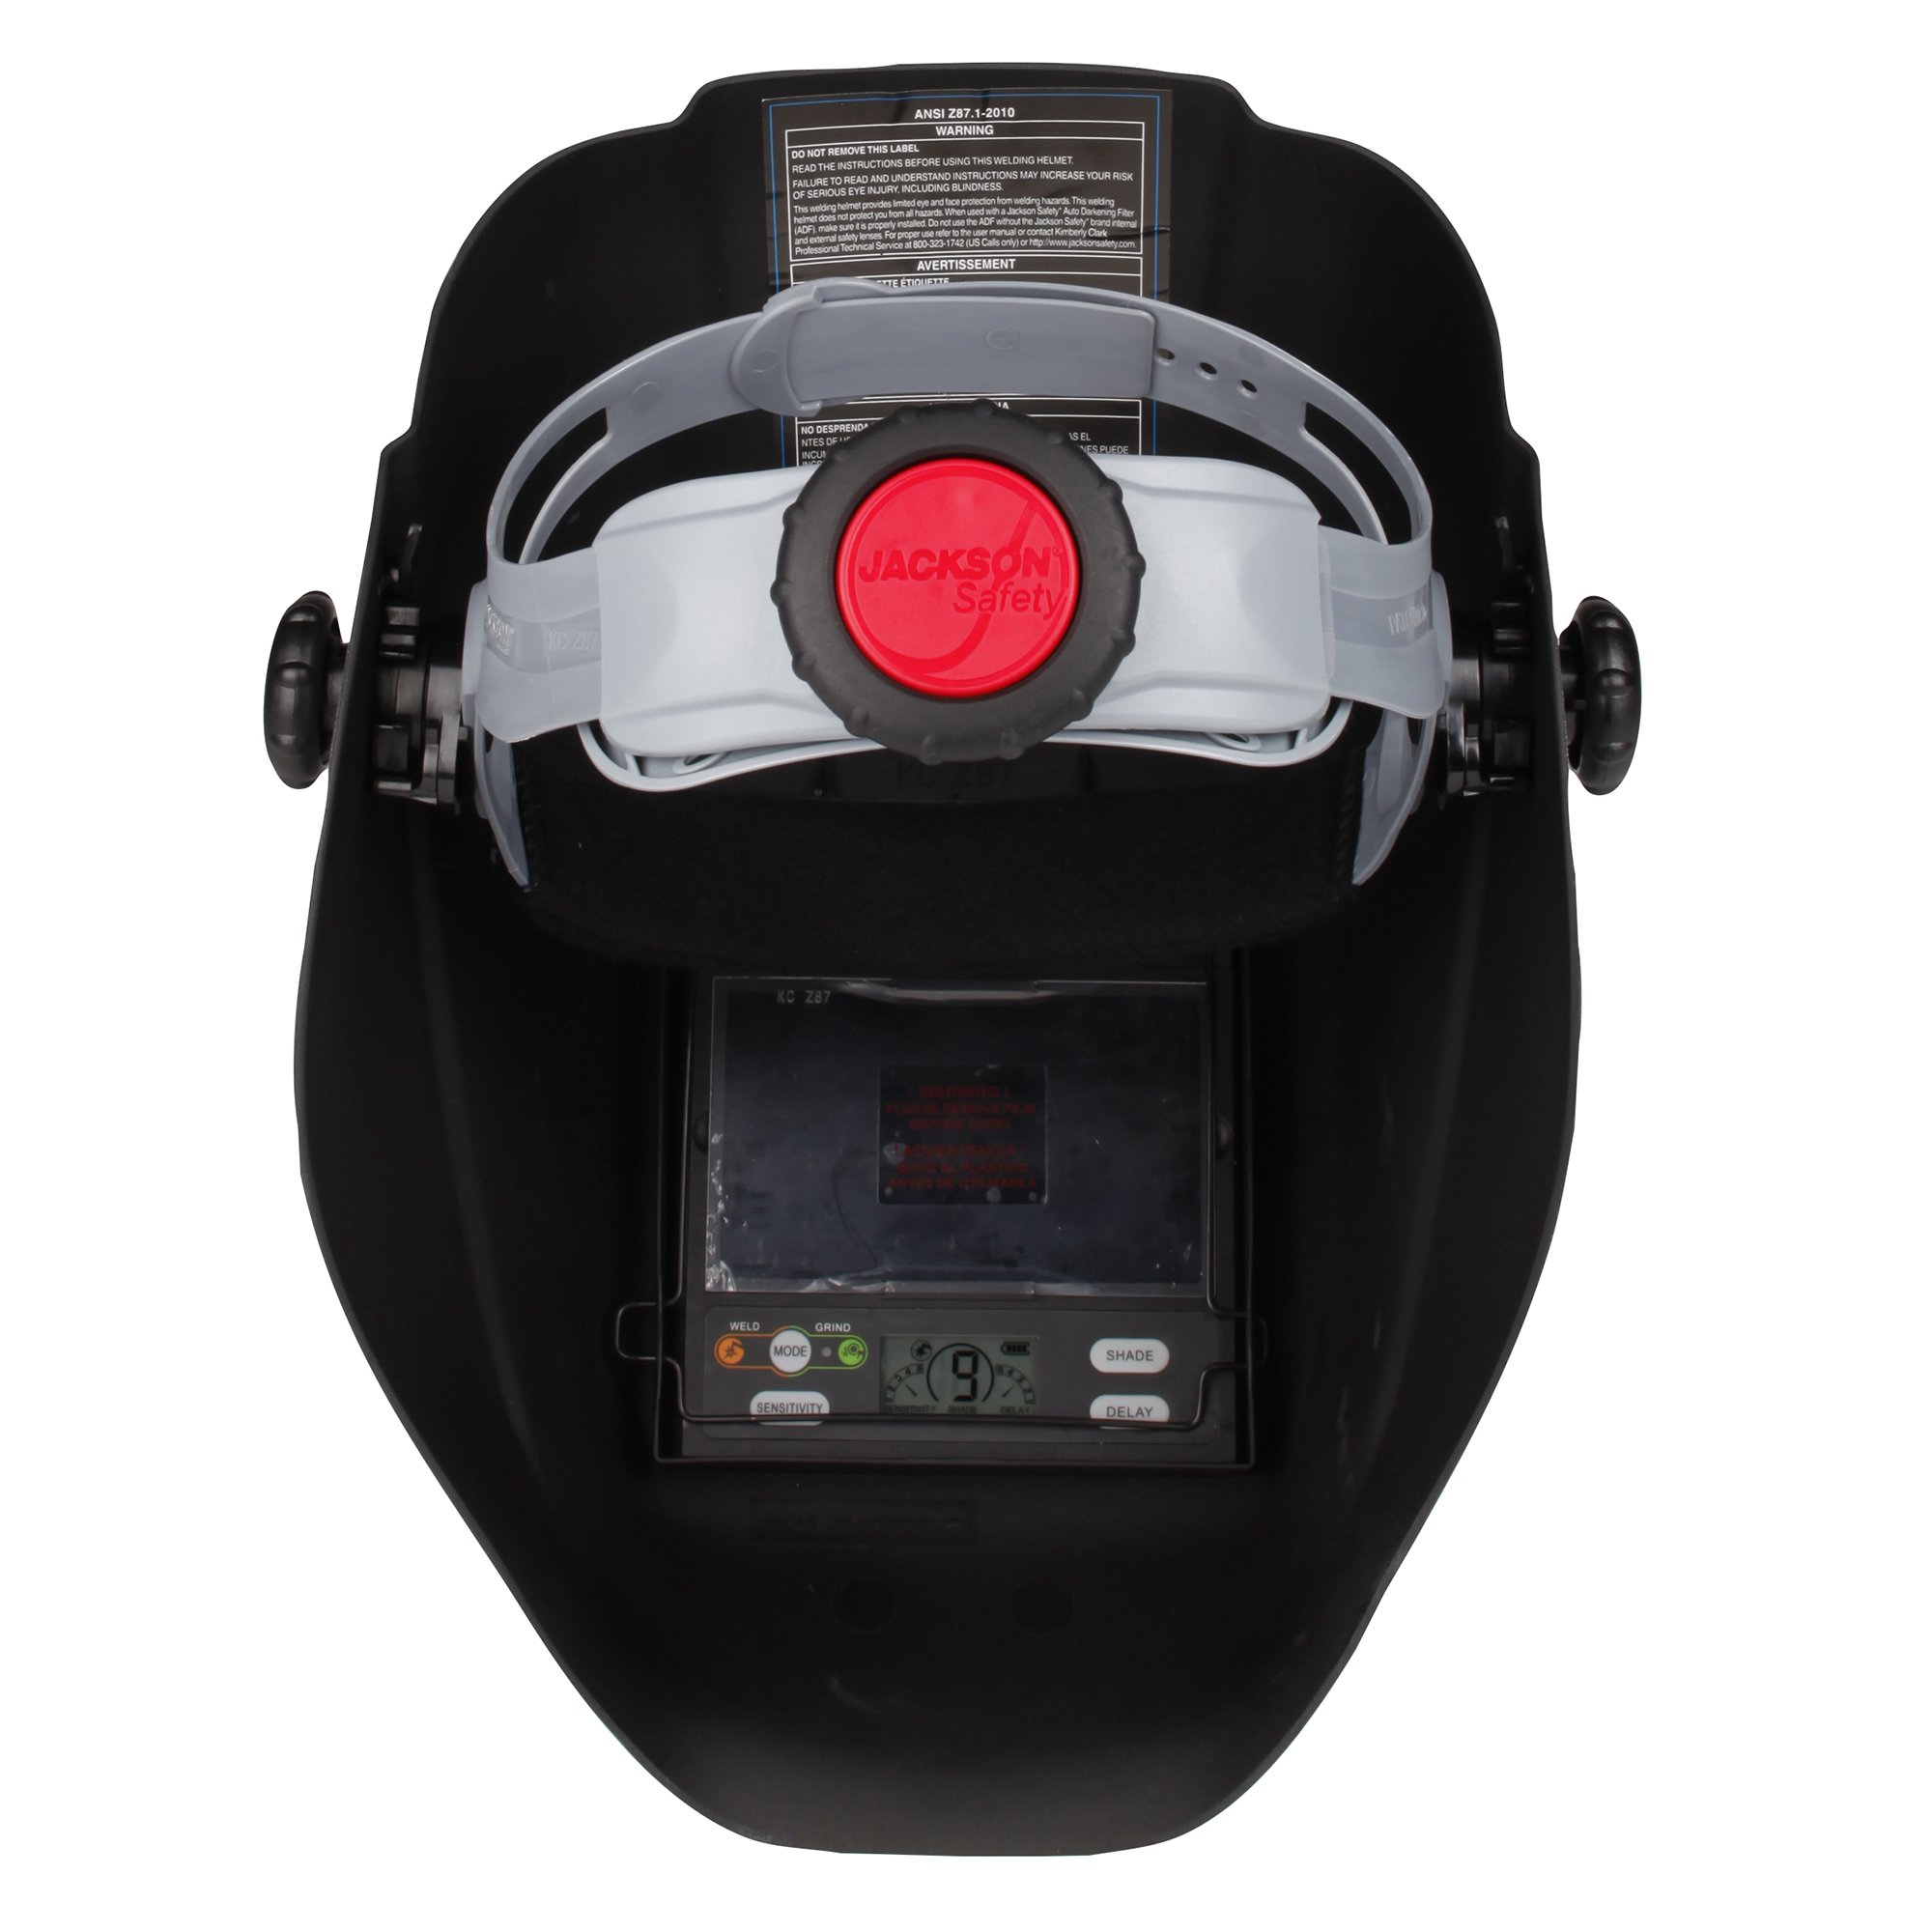 Jackson Safety Insight Variable Auto Darkening Welding Helmet, HaloX (46130), Arc Angel, 1 Helmet / Order by Jackson Safety (Image #4)